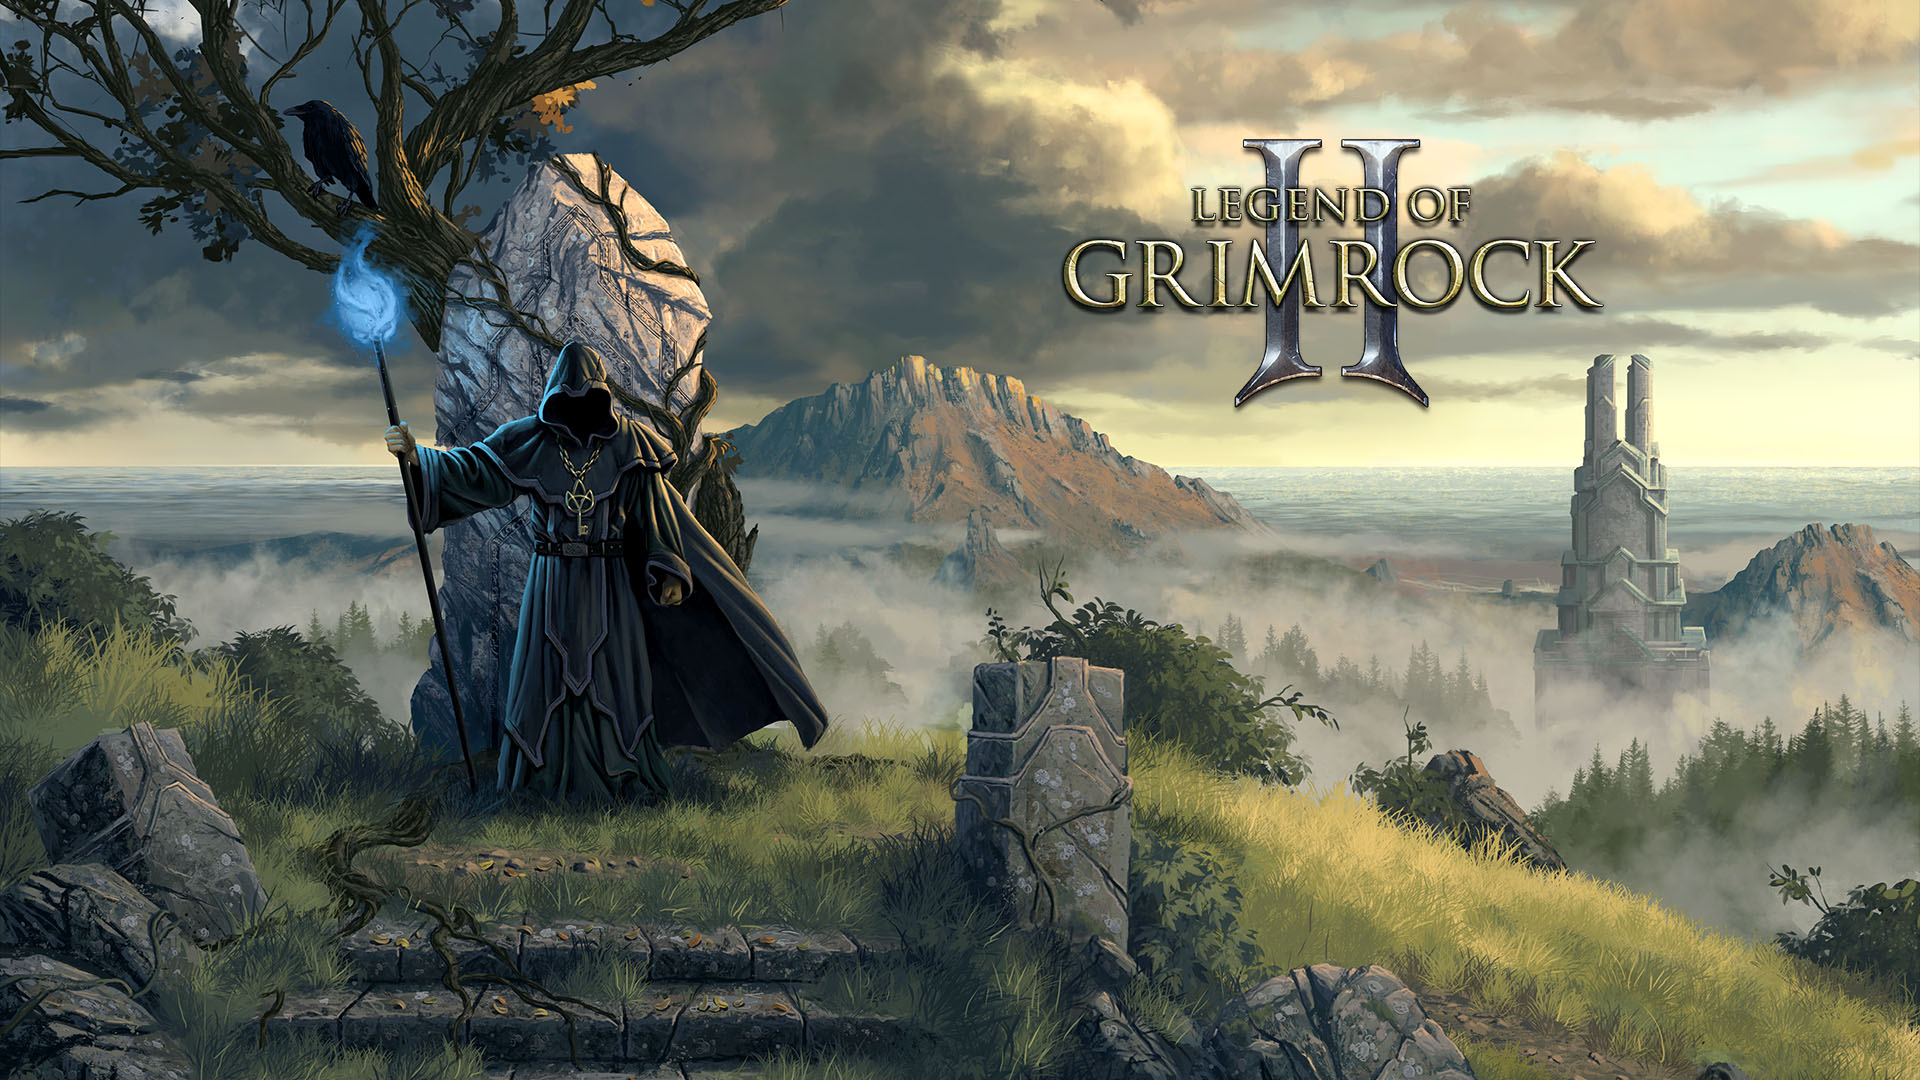 RPG old school : Dungeon Master, Eye Of Beholder, Grimrock.. - Page 3 Log2_keyart_1920x1080